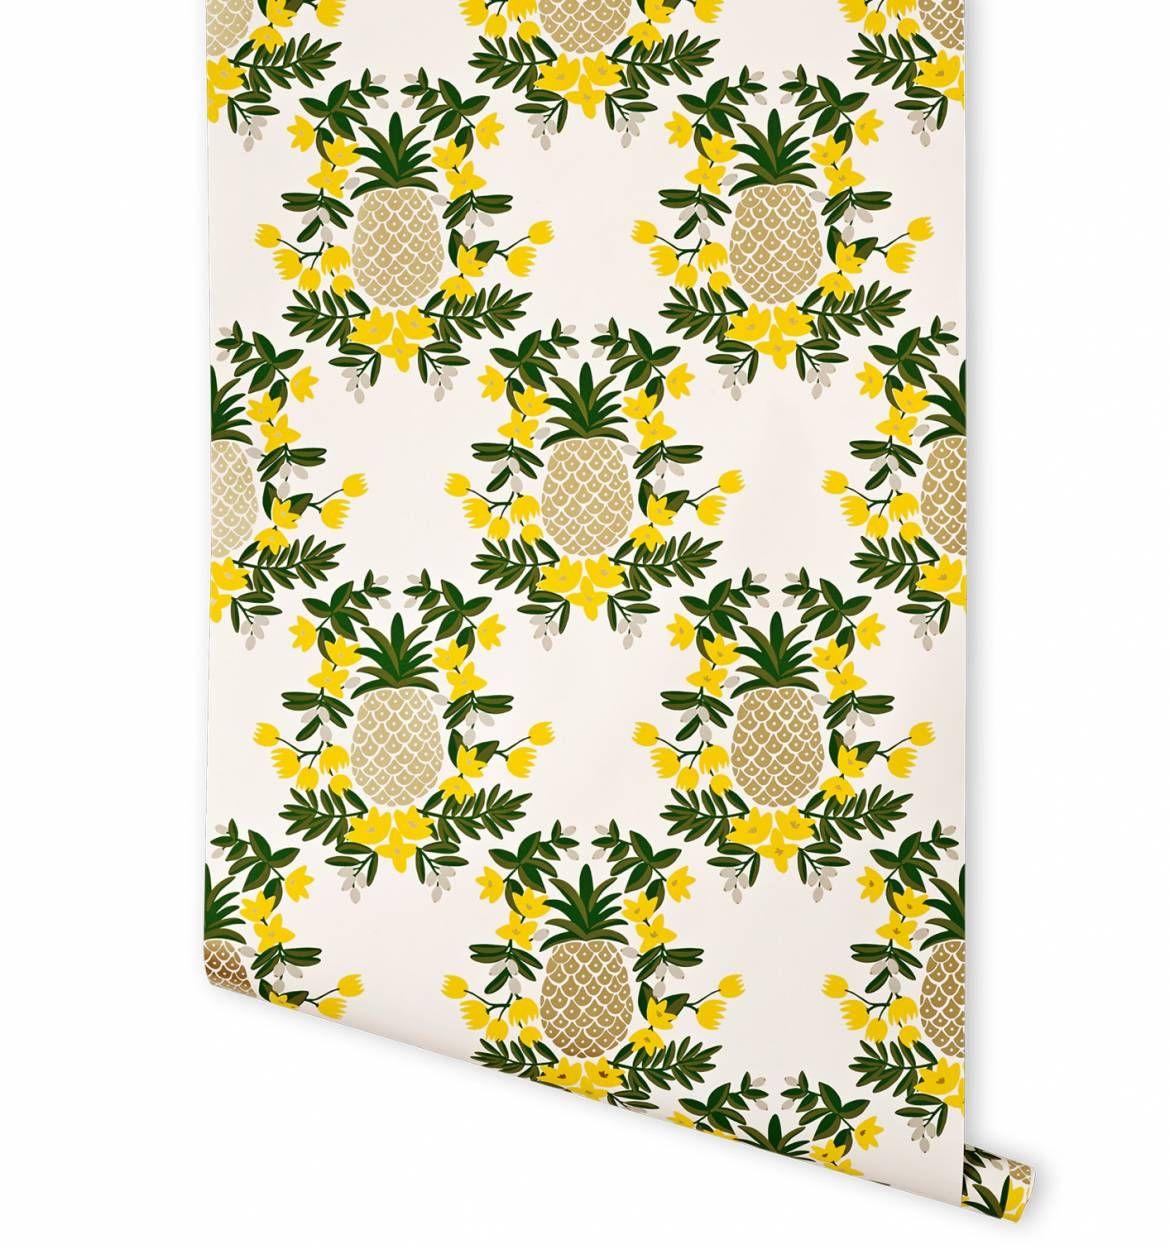 Good Wallpaper Home Screen Pineapple - 68cee6325f8cdde3d9ed250df4873b7f  Trends_549399.jpg